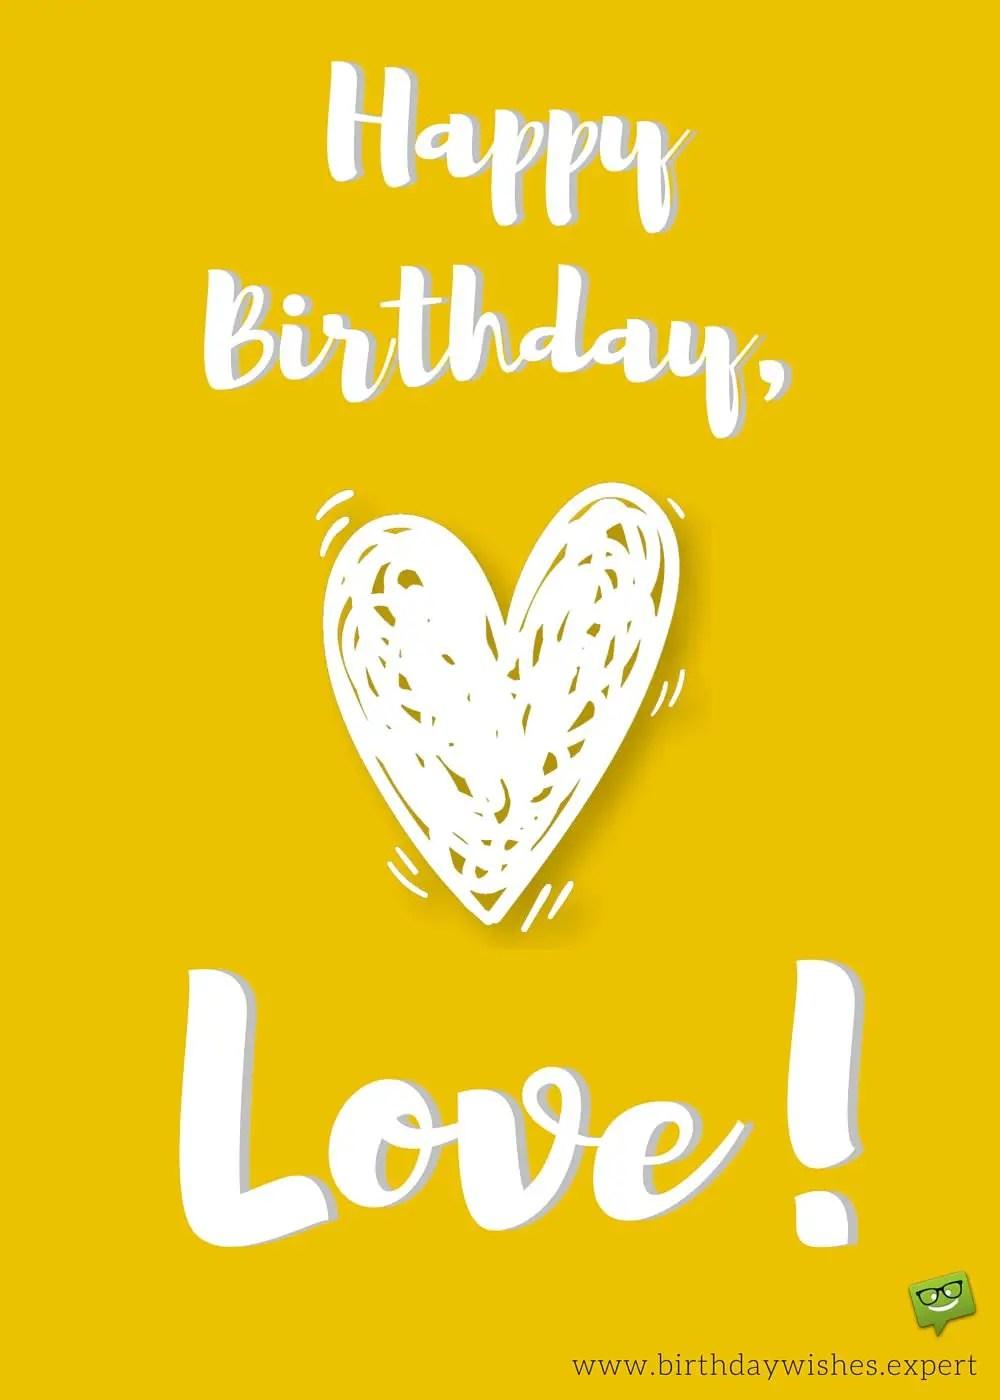 Enamour Happy Supposedly Wiser Ny Birthday Wishes Your Husband Ny Ways To Say Happy Birthday Through Text Ny Ways To Say Happy Birthday To Friend gifts Funny Ways To Say Happy Birthday